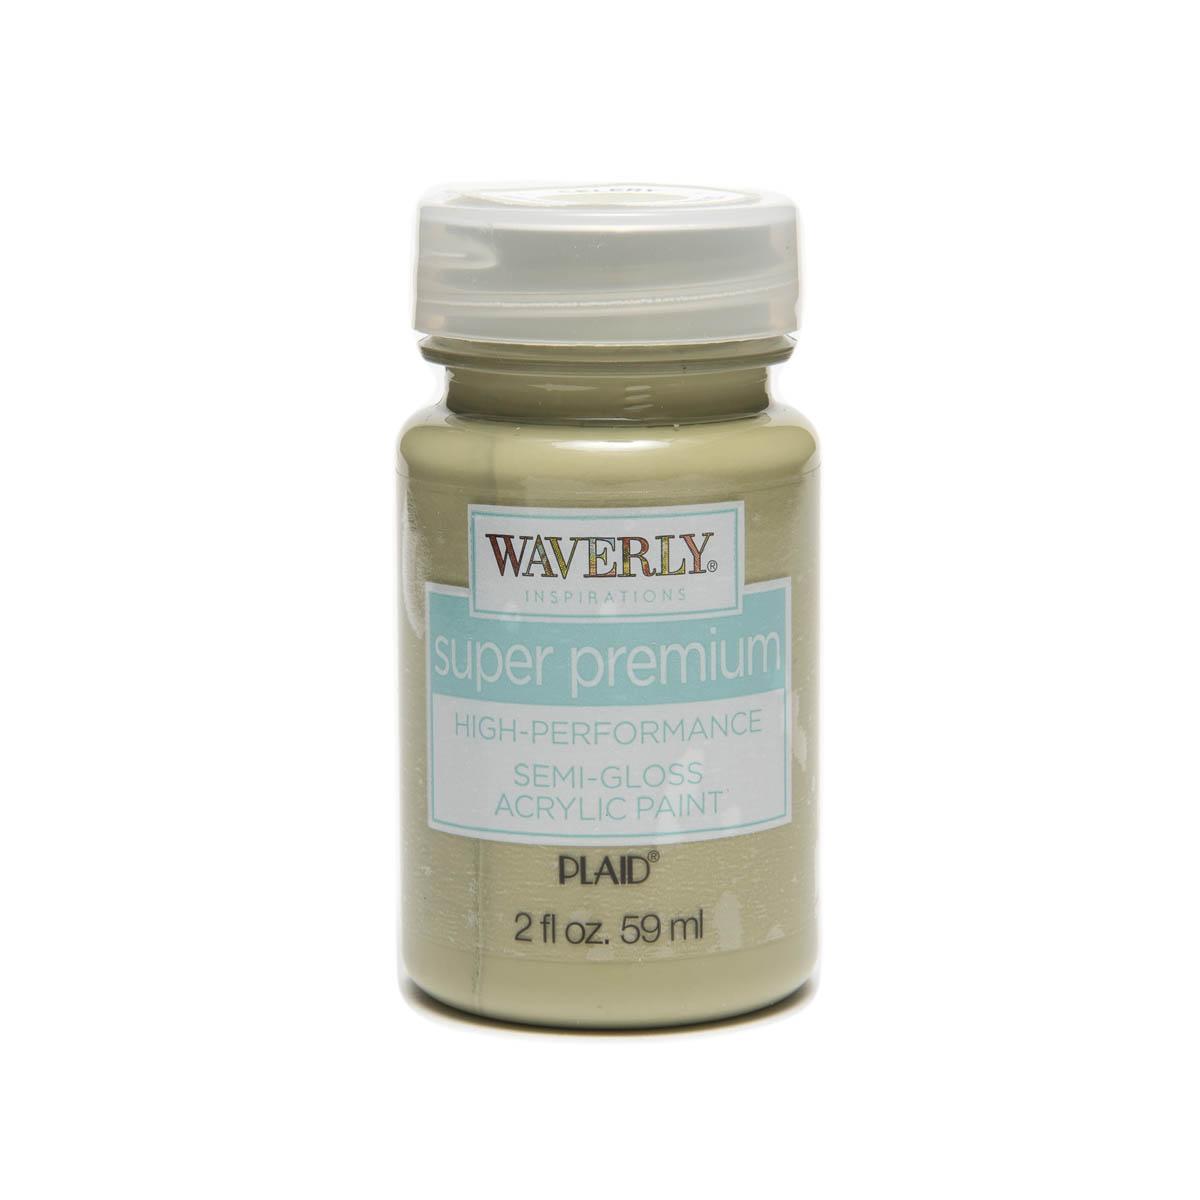 Waverly ® Inspirations Super Premium Semi-Gloss Acrylic Paint - Celery, 2 oz.